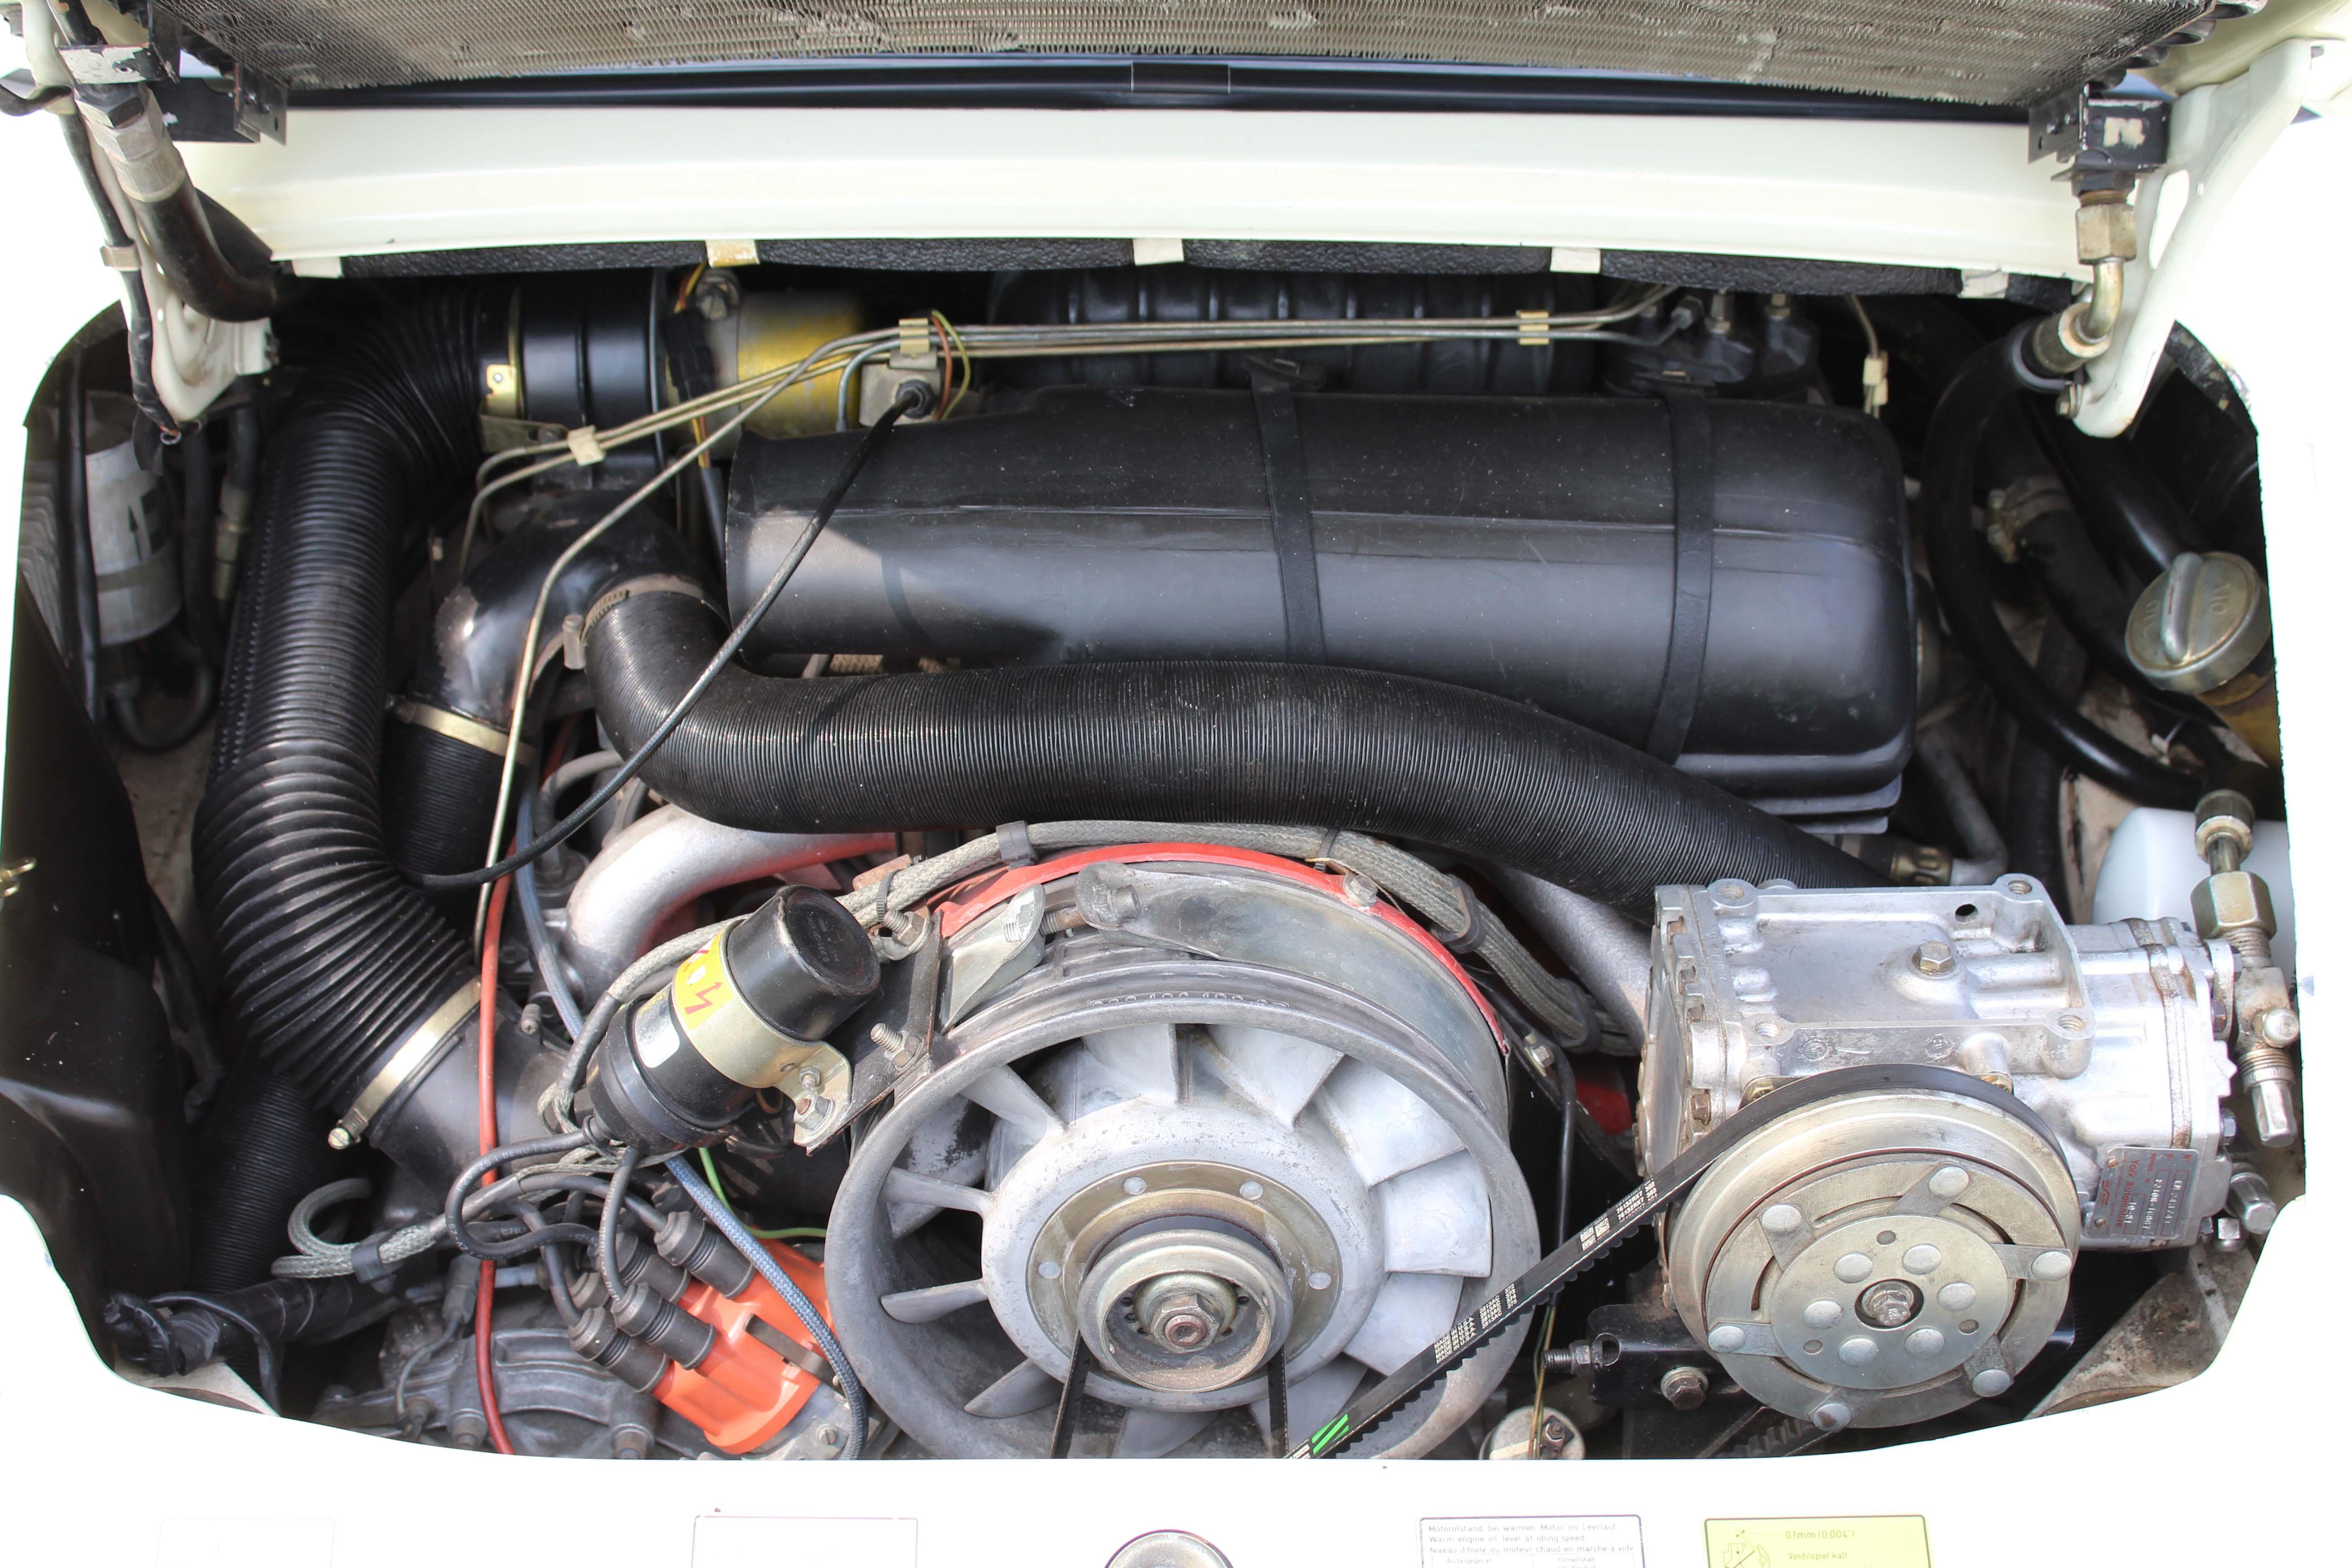 IMG_5298 - Engine